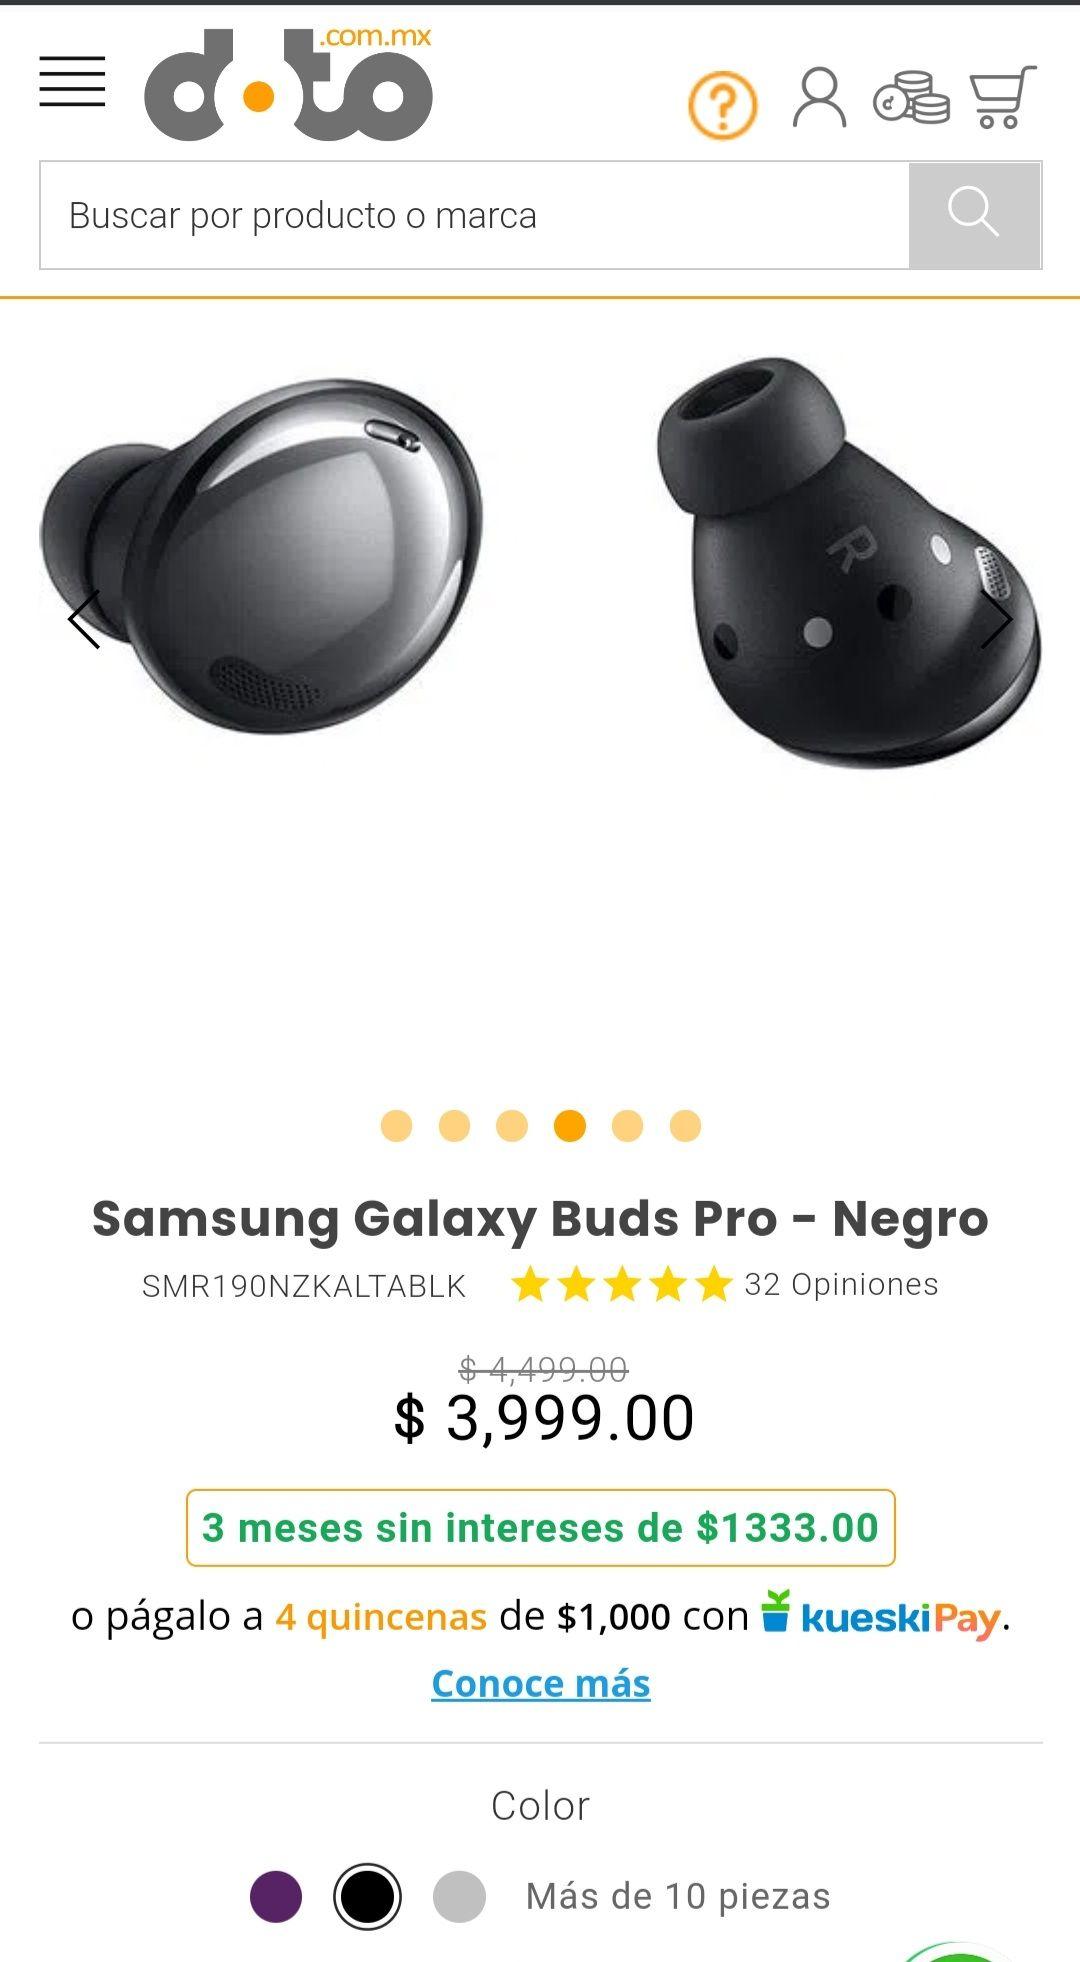 Doto: Samsung Galaxy buds pro